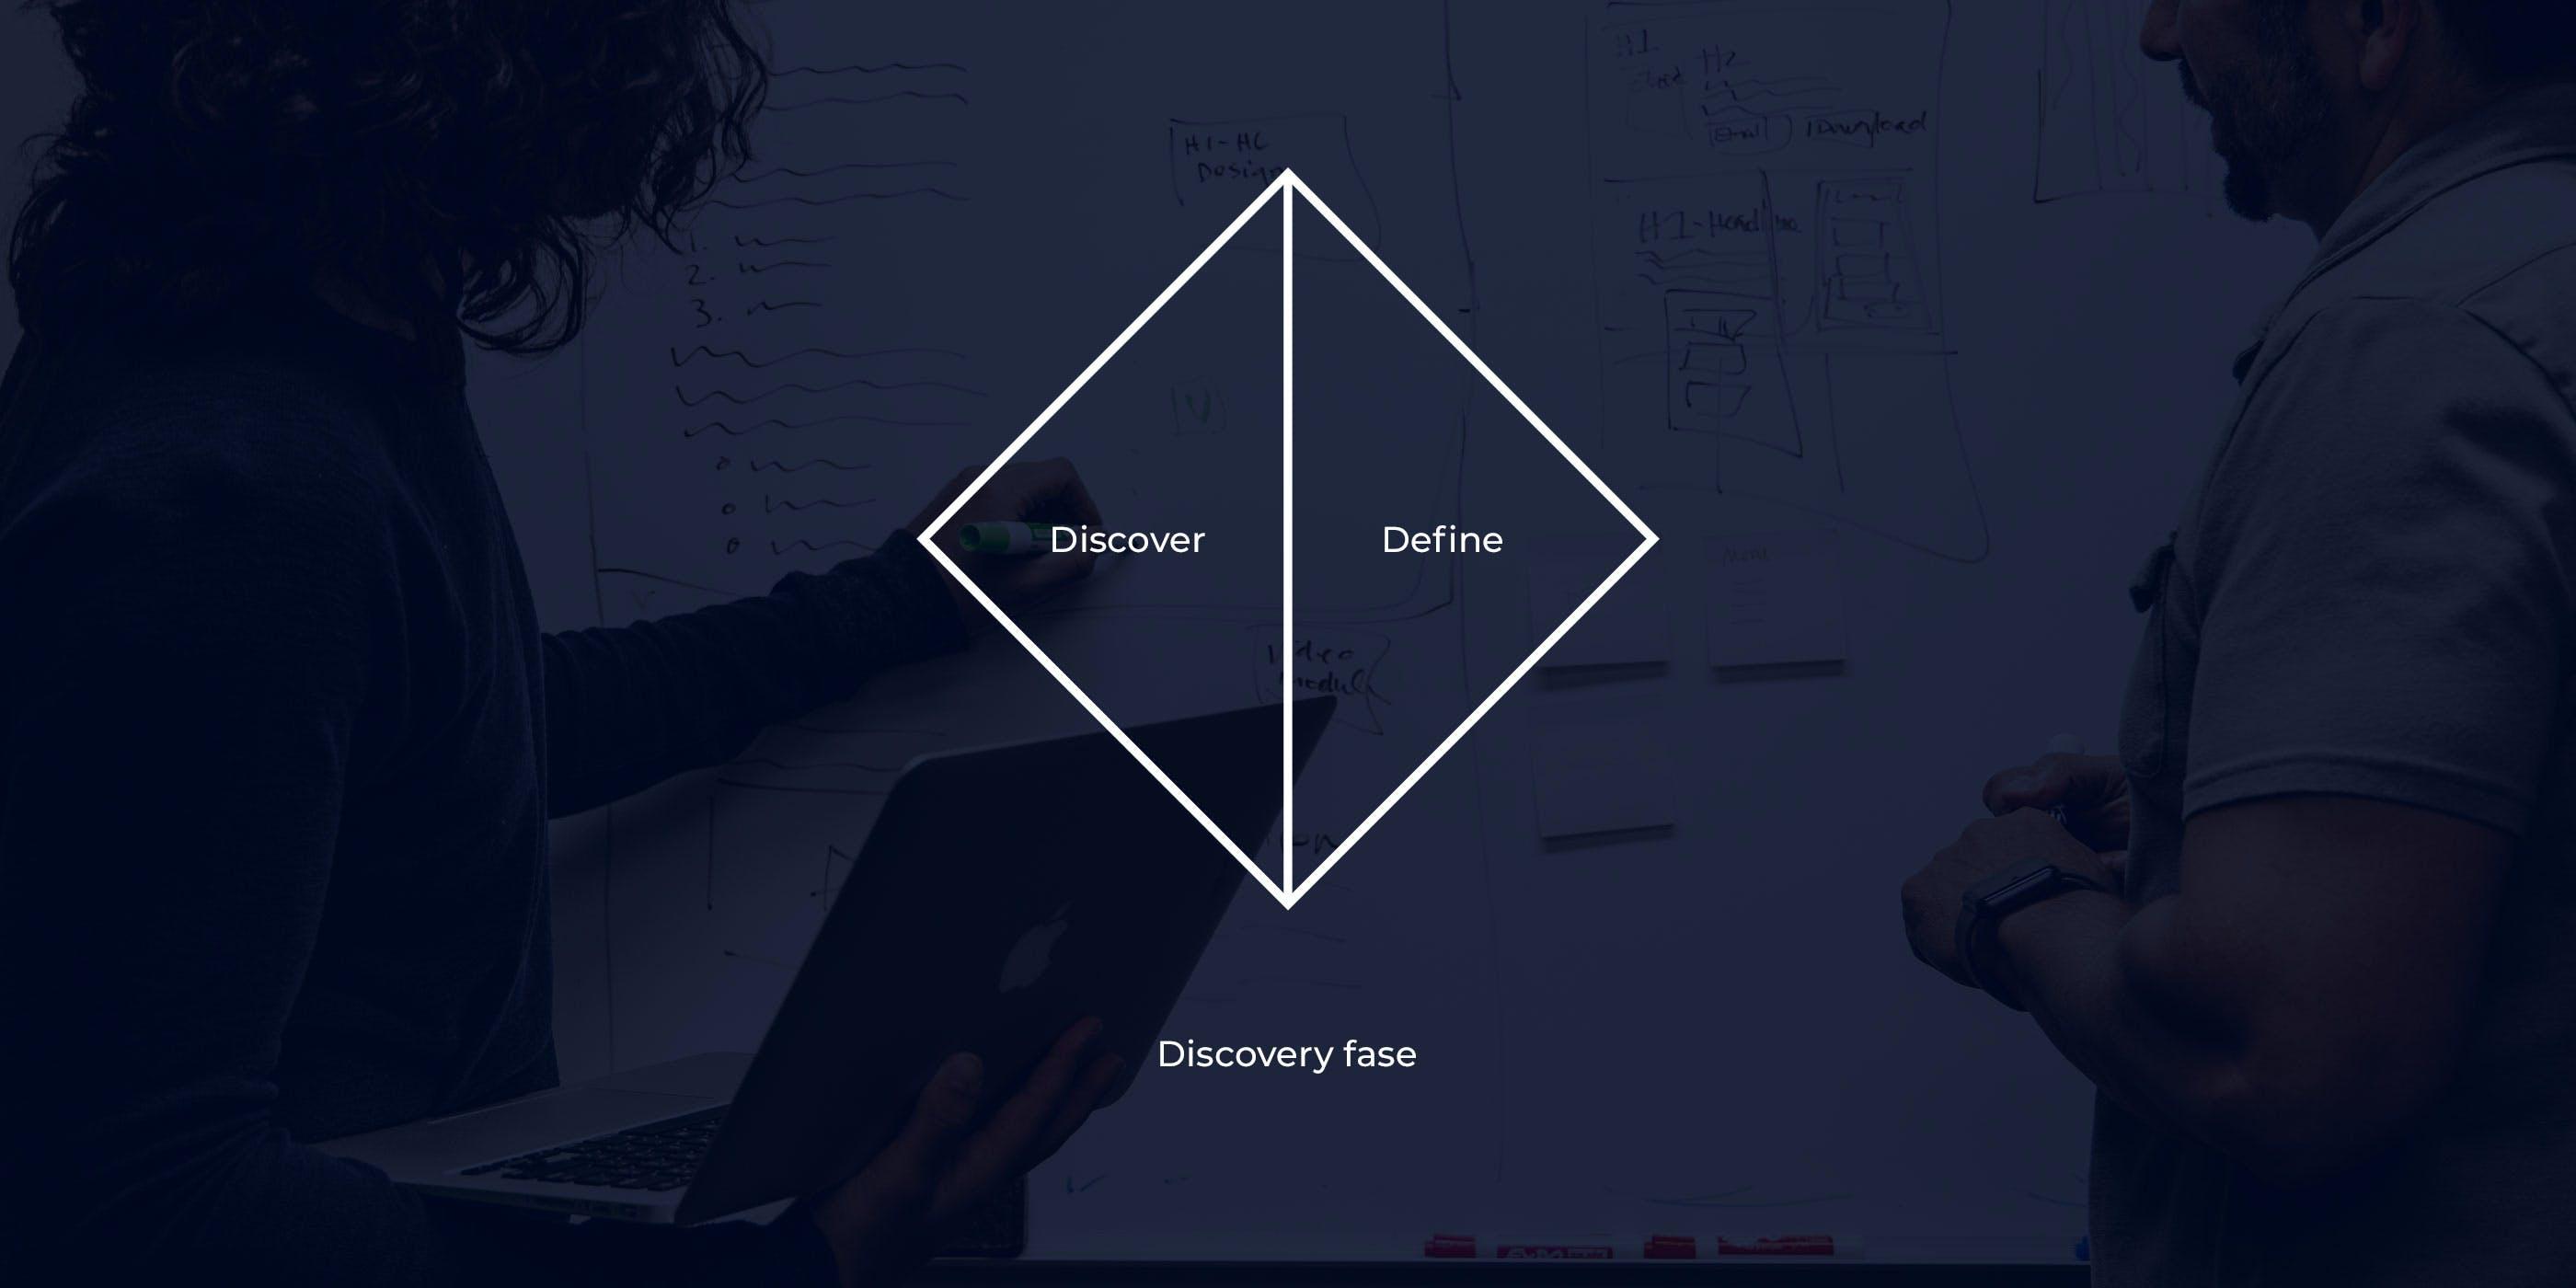 UX Discovery fase uitgelegd